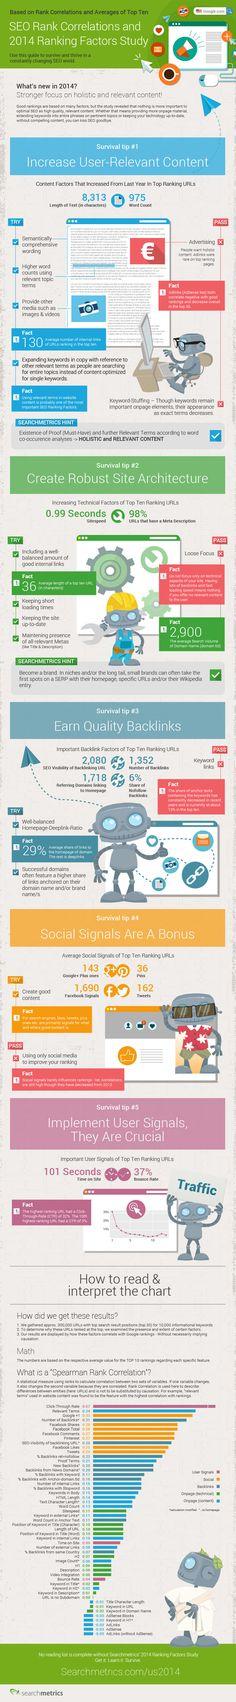 SEO Rank Correlations And Ranking Factors 2014 - #infographic #seo #socialmedia